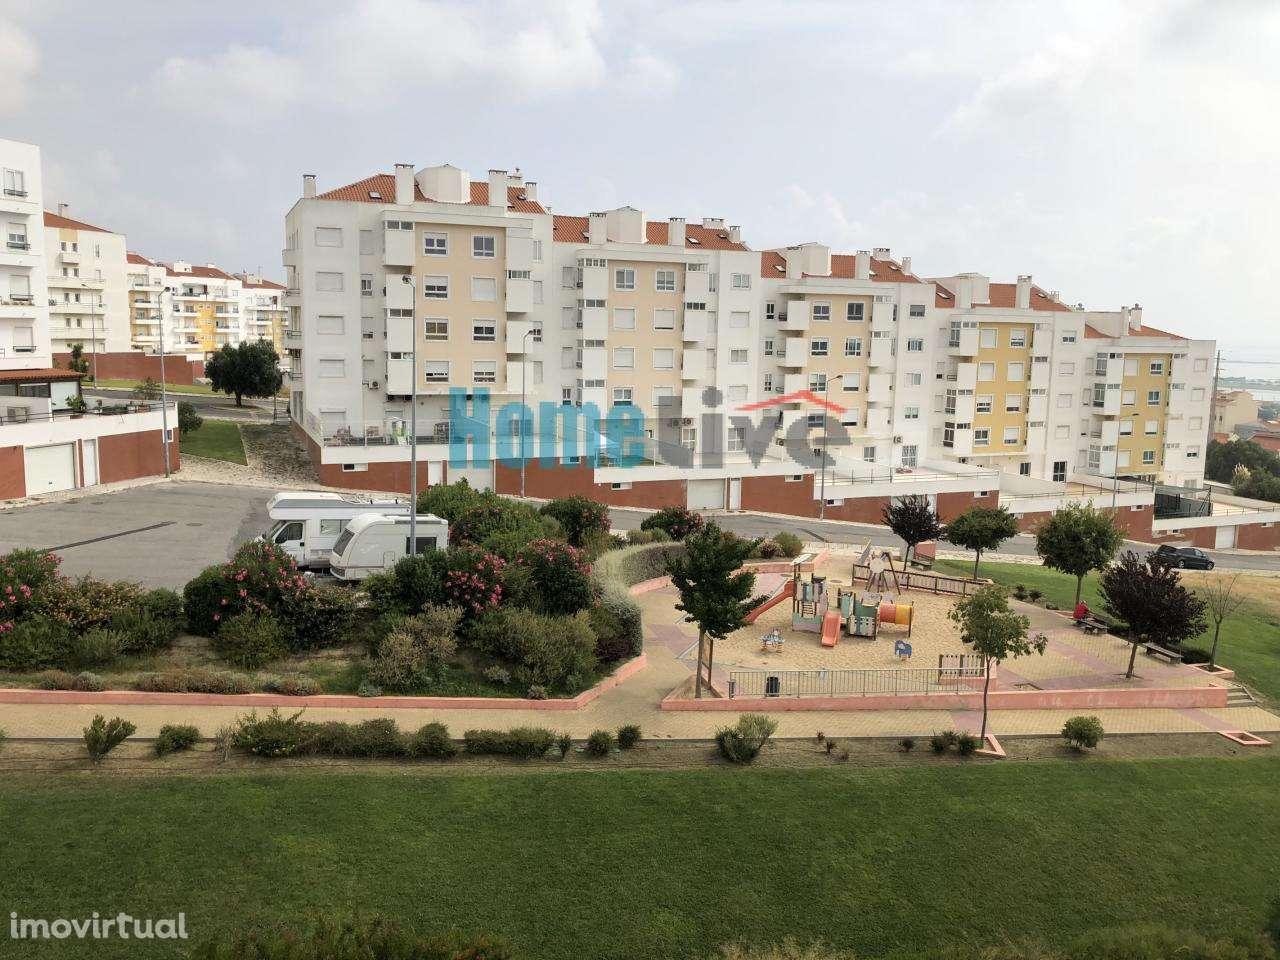 Apartamento para comprar, Póvoa de Santa Iria e Forte da Casa, Vila Franca de Xira, Lisboa - Foto 14